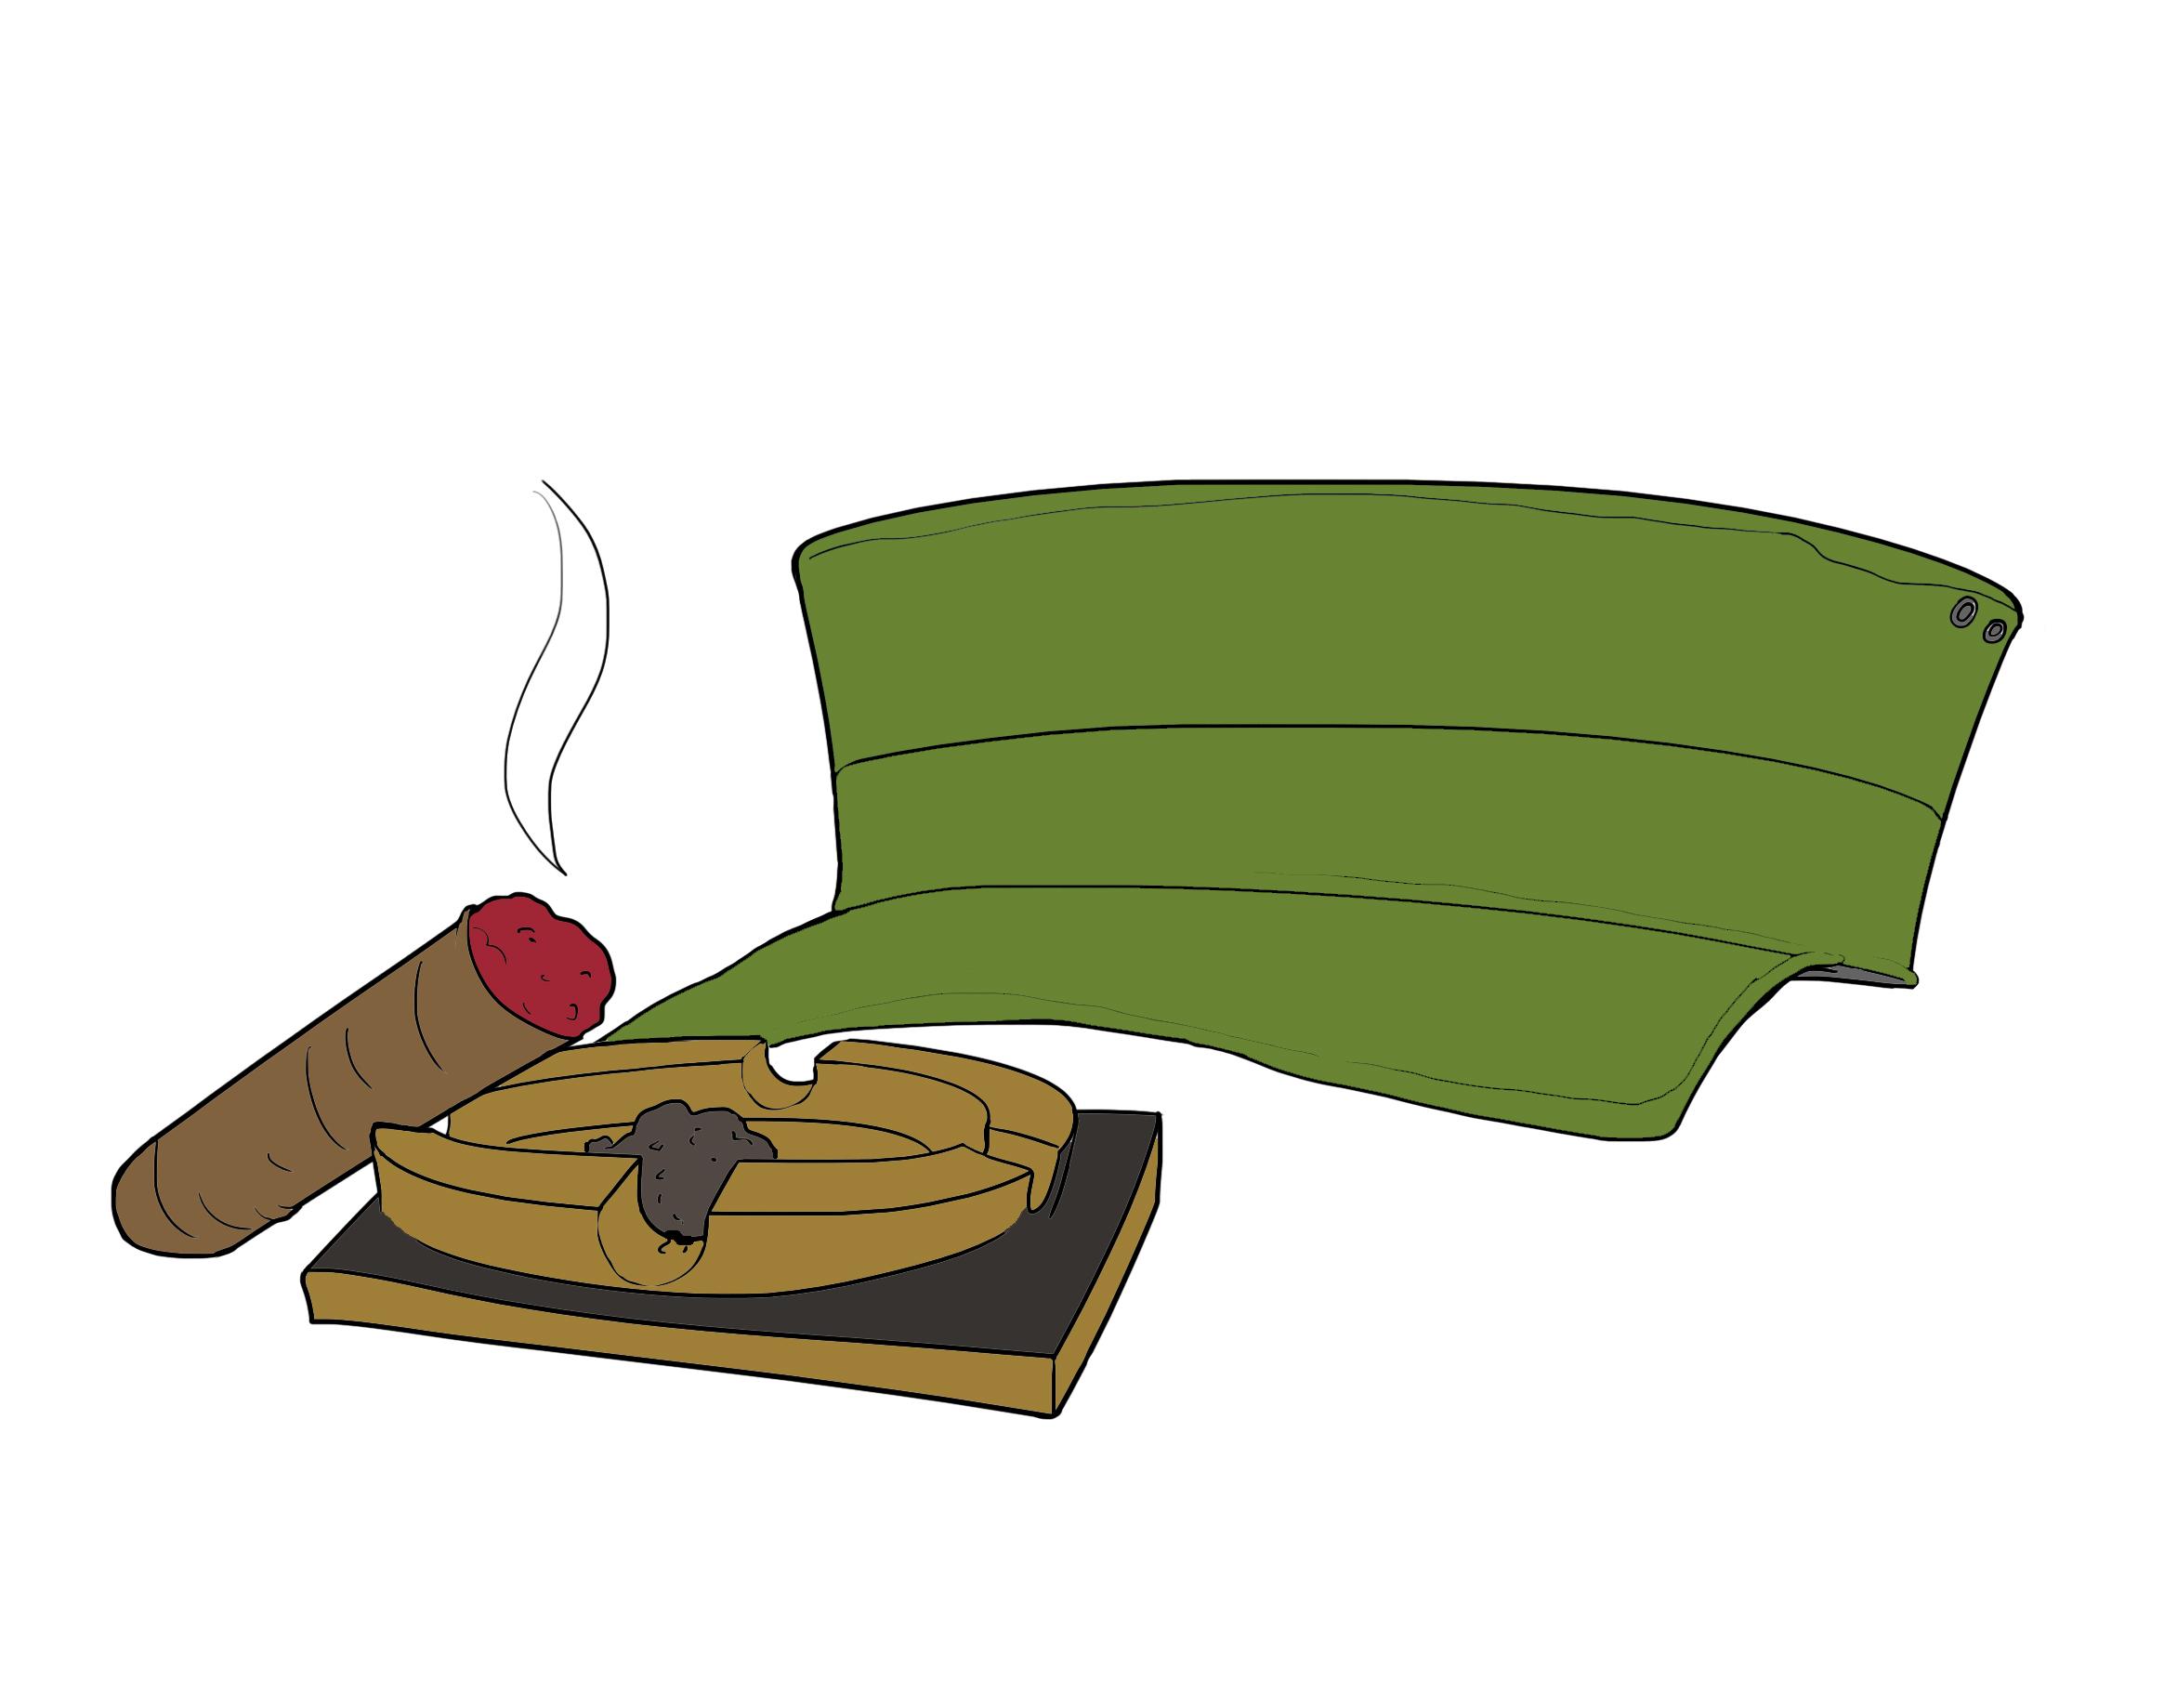 Adiós, Fidel. Illustration: Gustavo Reyes